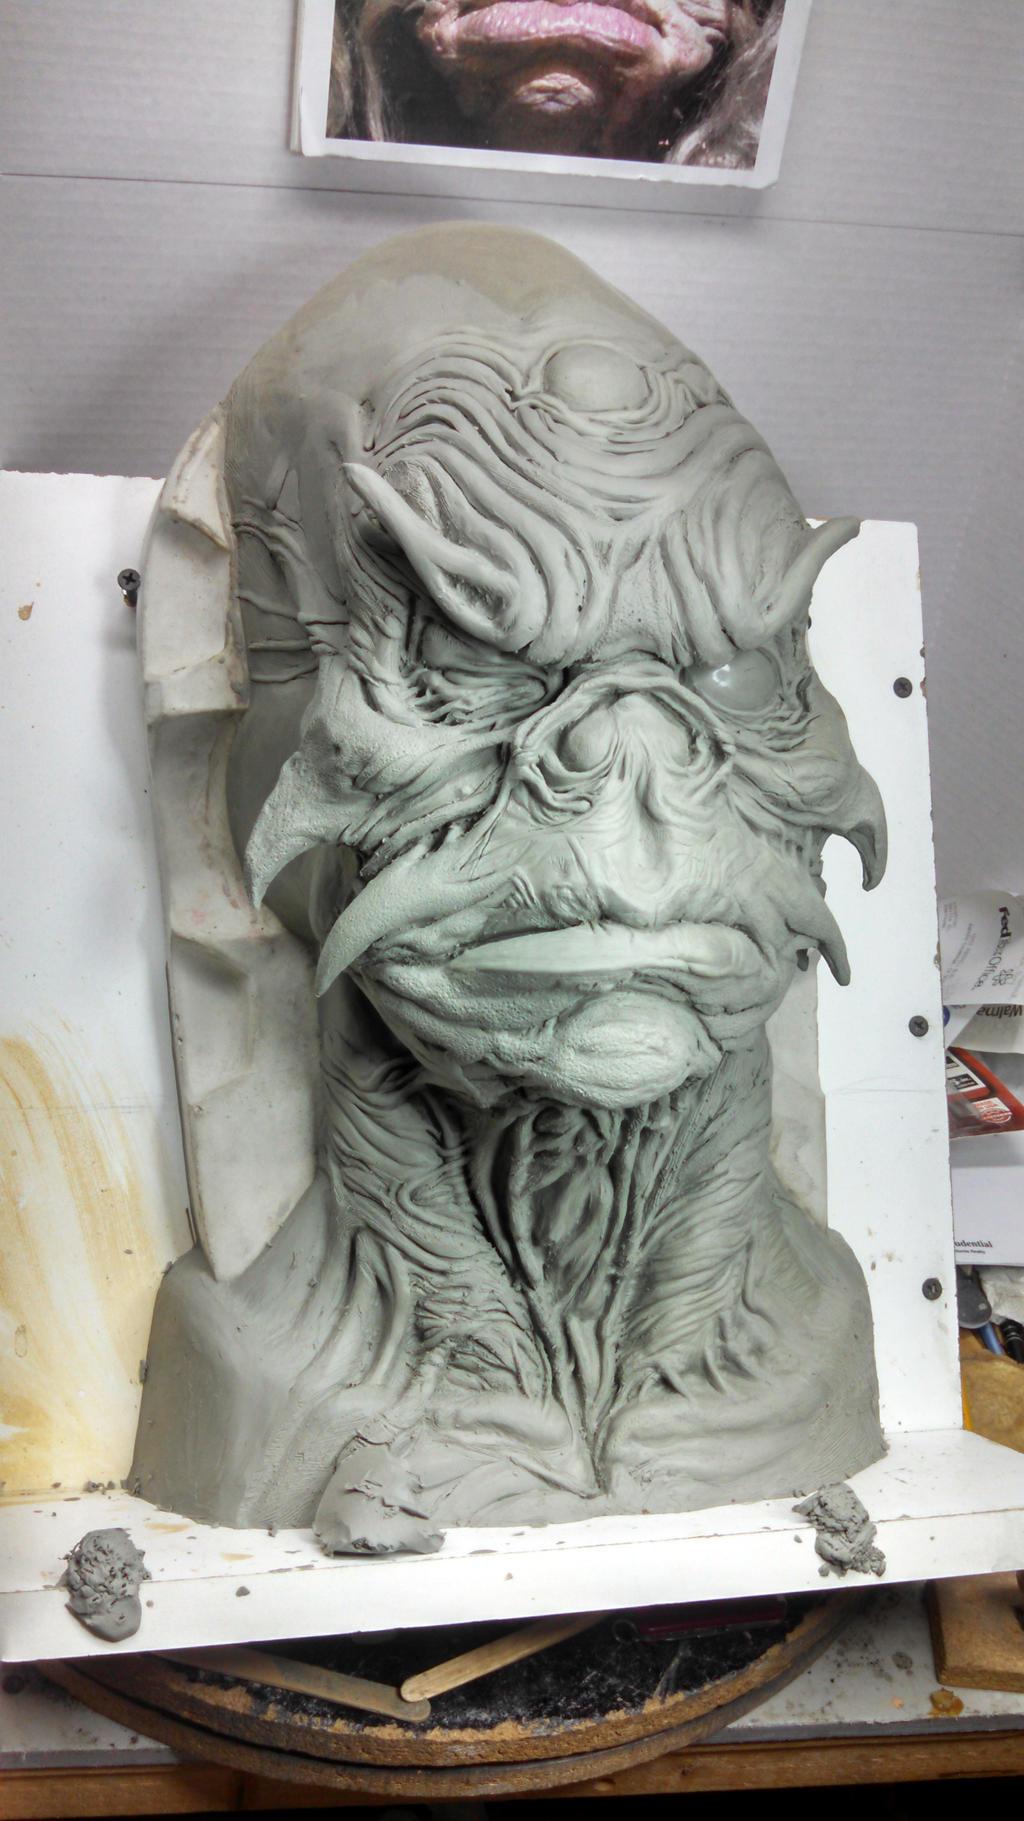 Aughra Sculpt 2 by propsculptor on DeviantArt